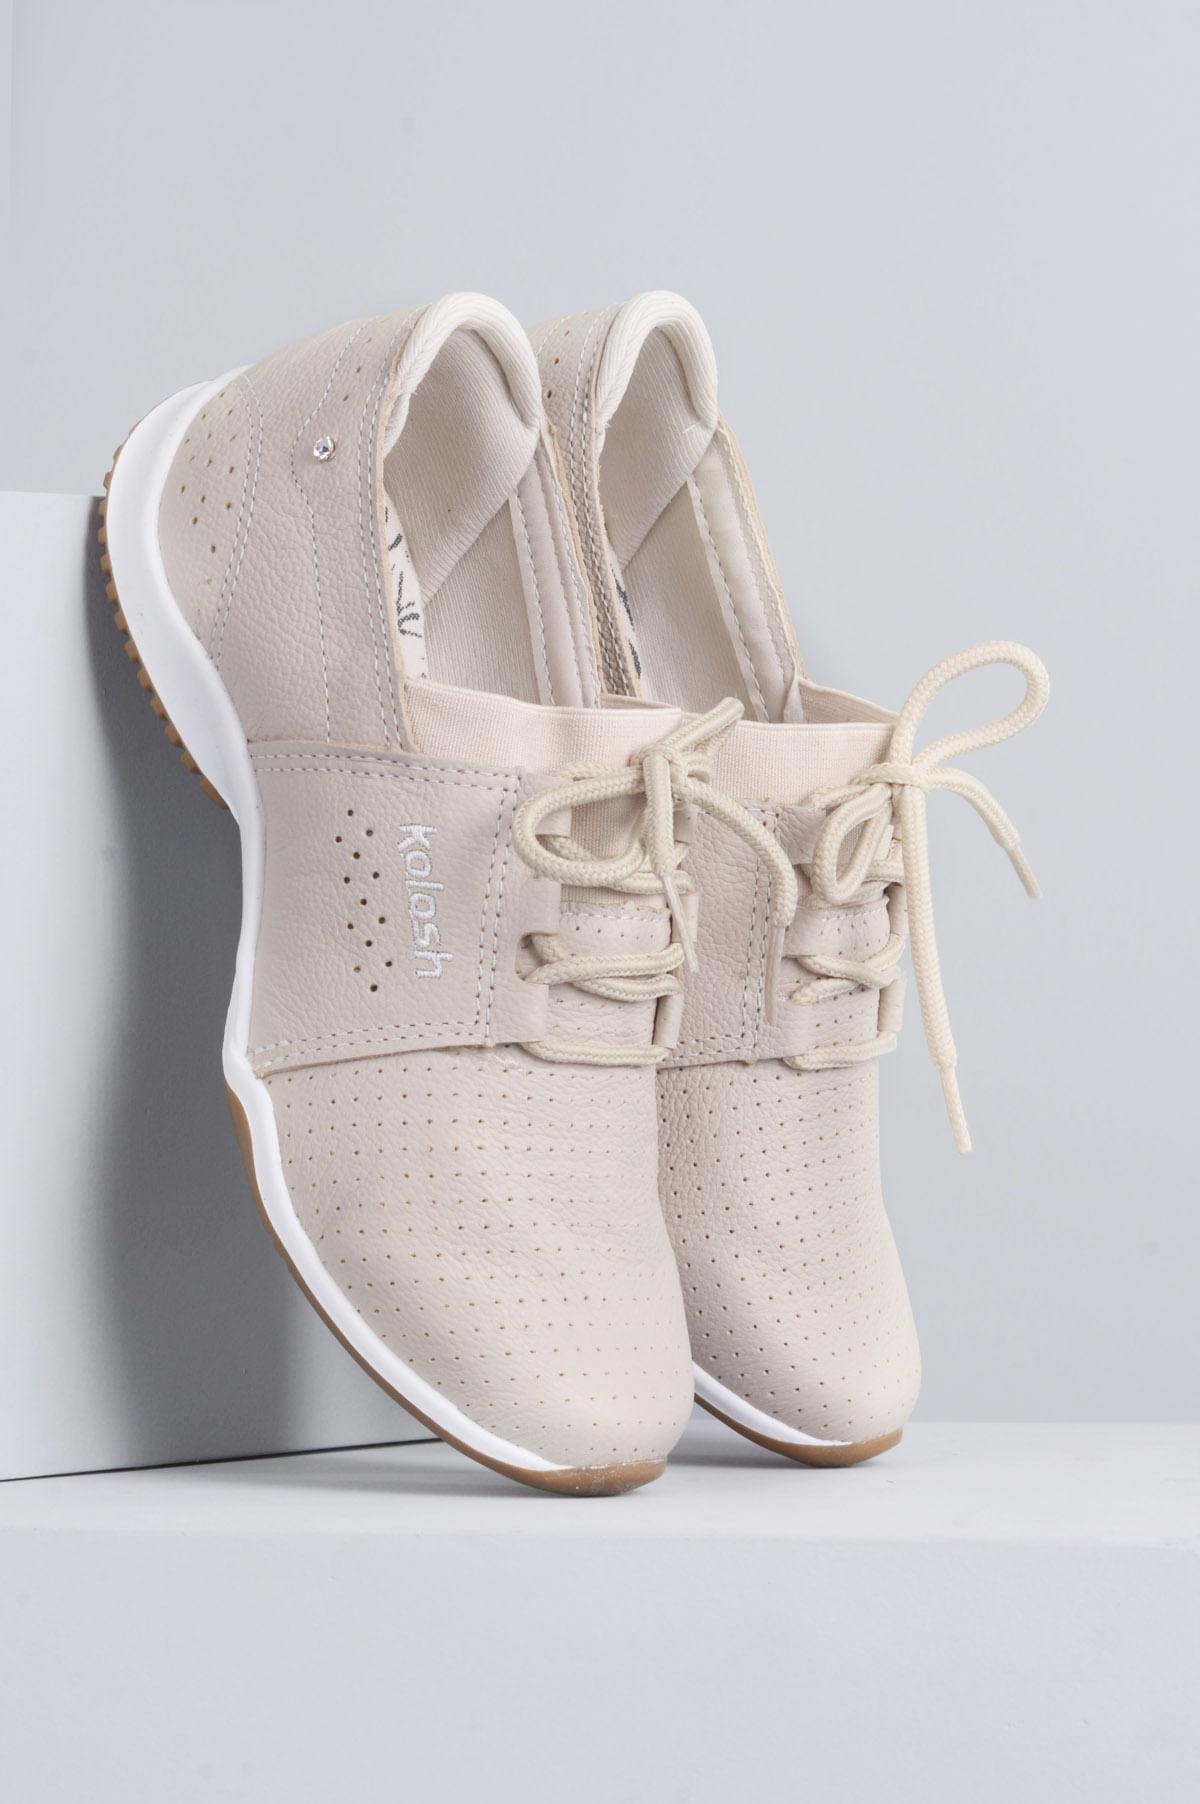 0960844bd88 Tênis Feminino Hades Kolosh CR - OFF WHITE - Mundial Calçados